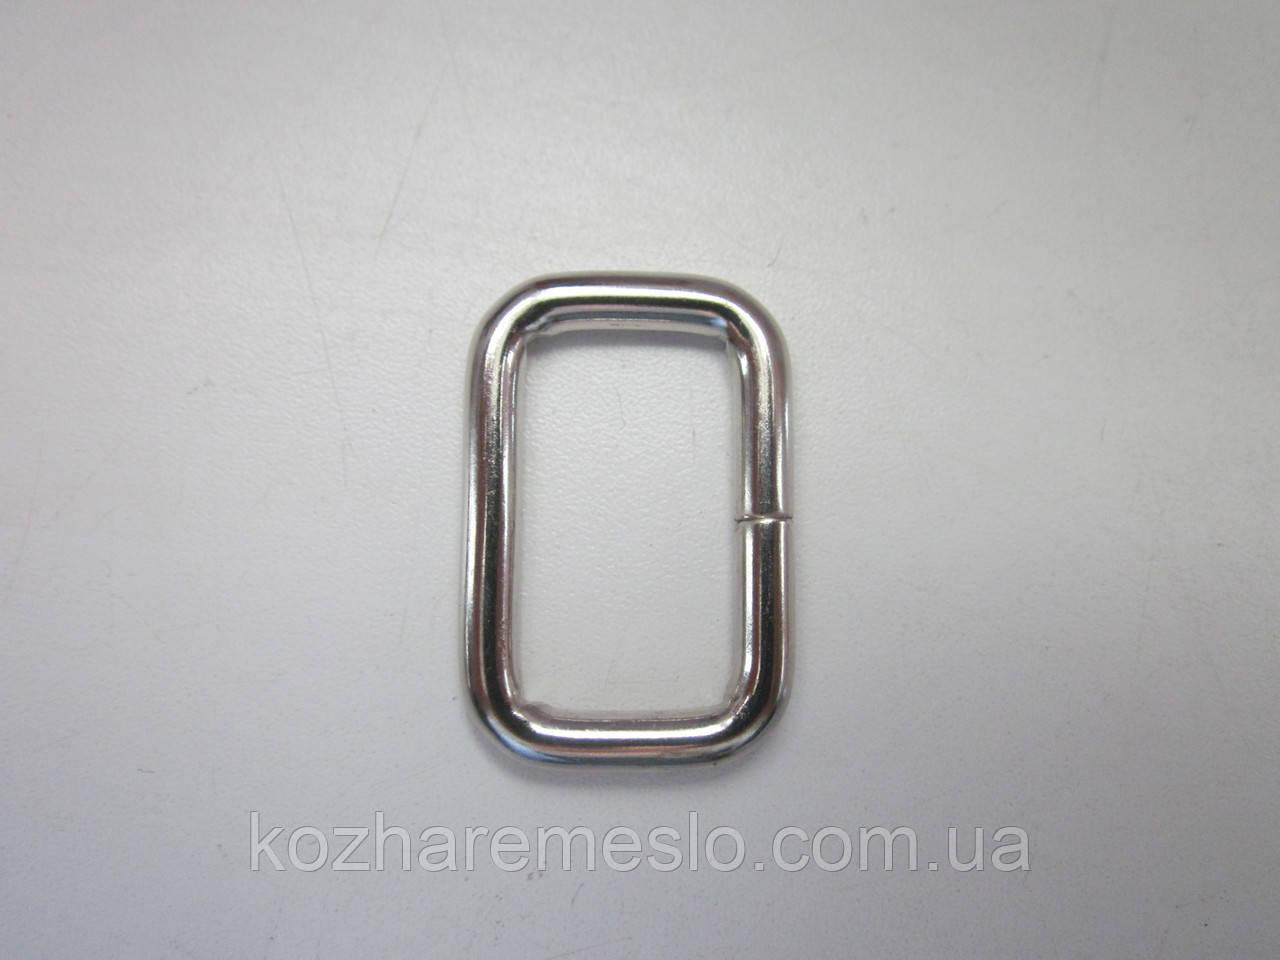 Рамка 4 х 25 х 20 никель